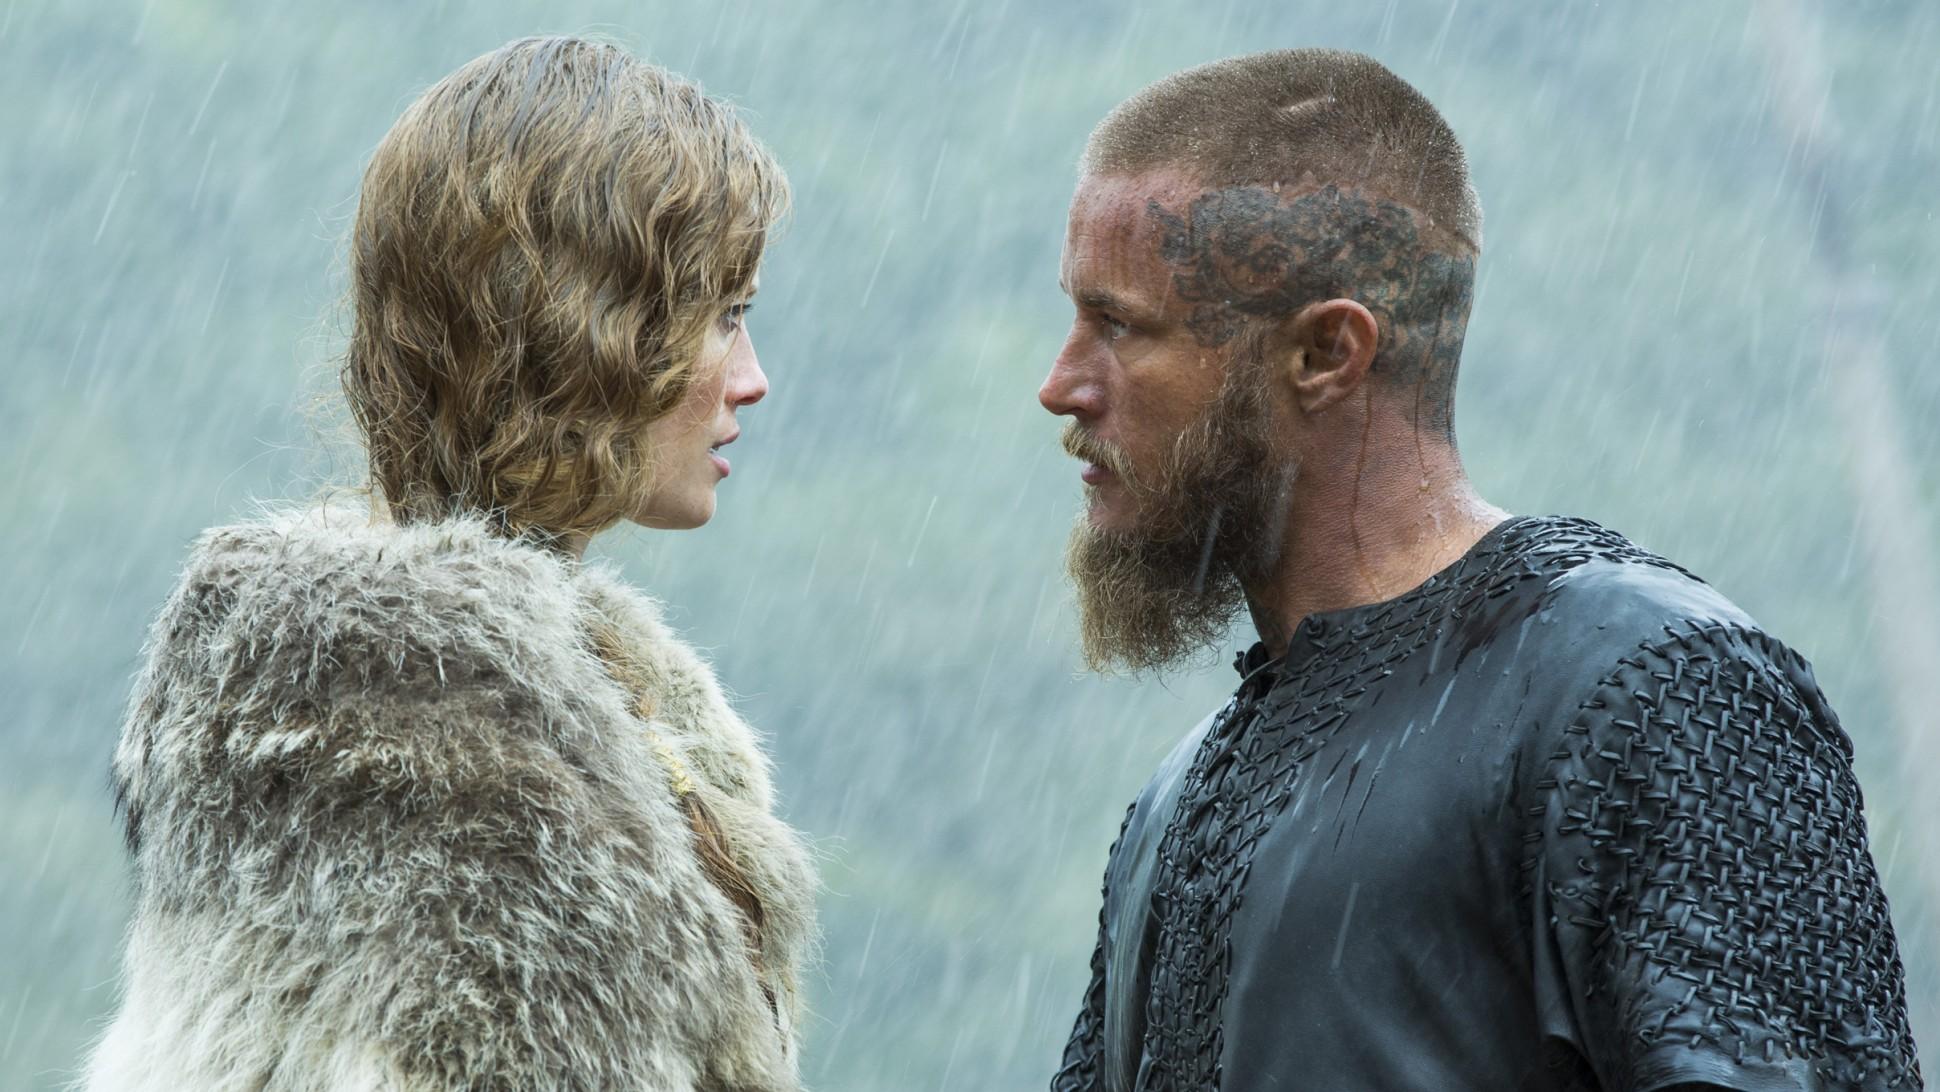 Vikings Season 3 Recap – Episode 5: The Usurper | Vikings